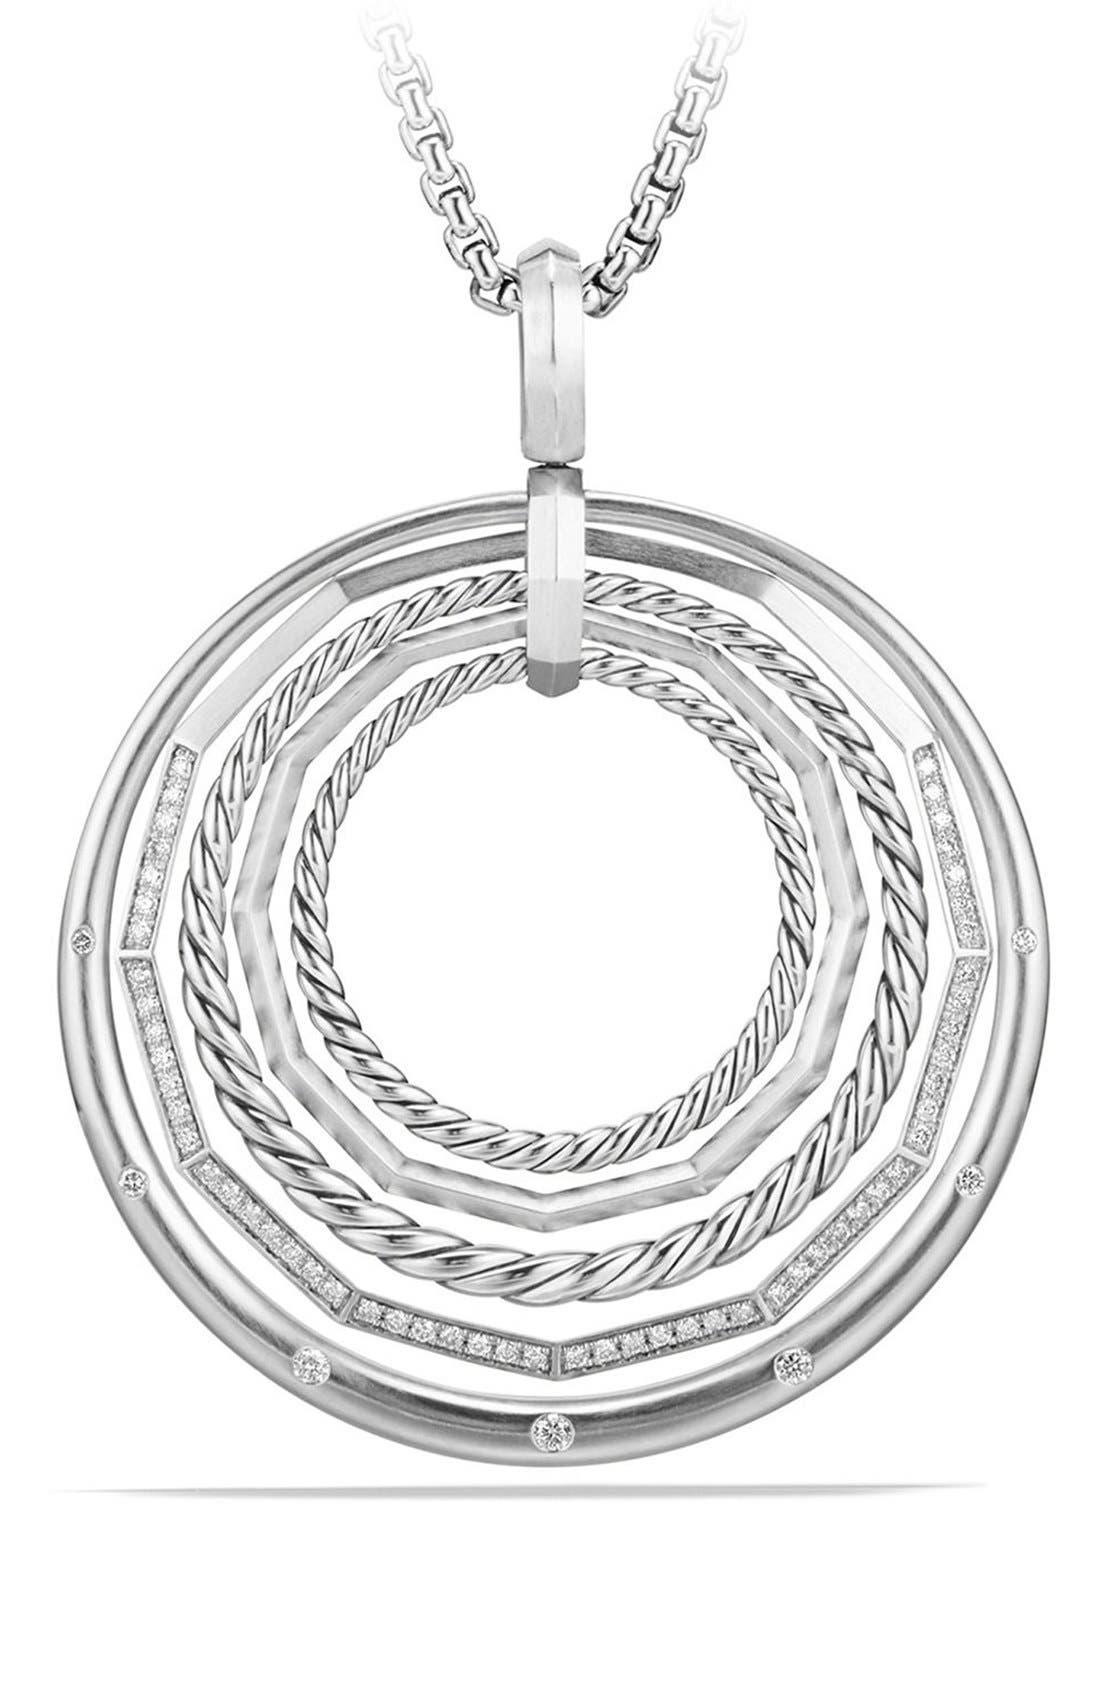 Main Image - David Yurman Stax Large Pendant Necklace with Diamonds